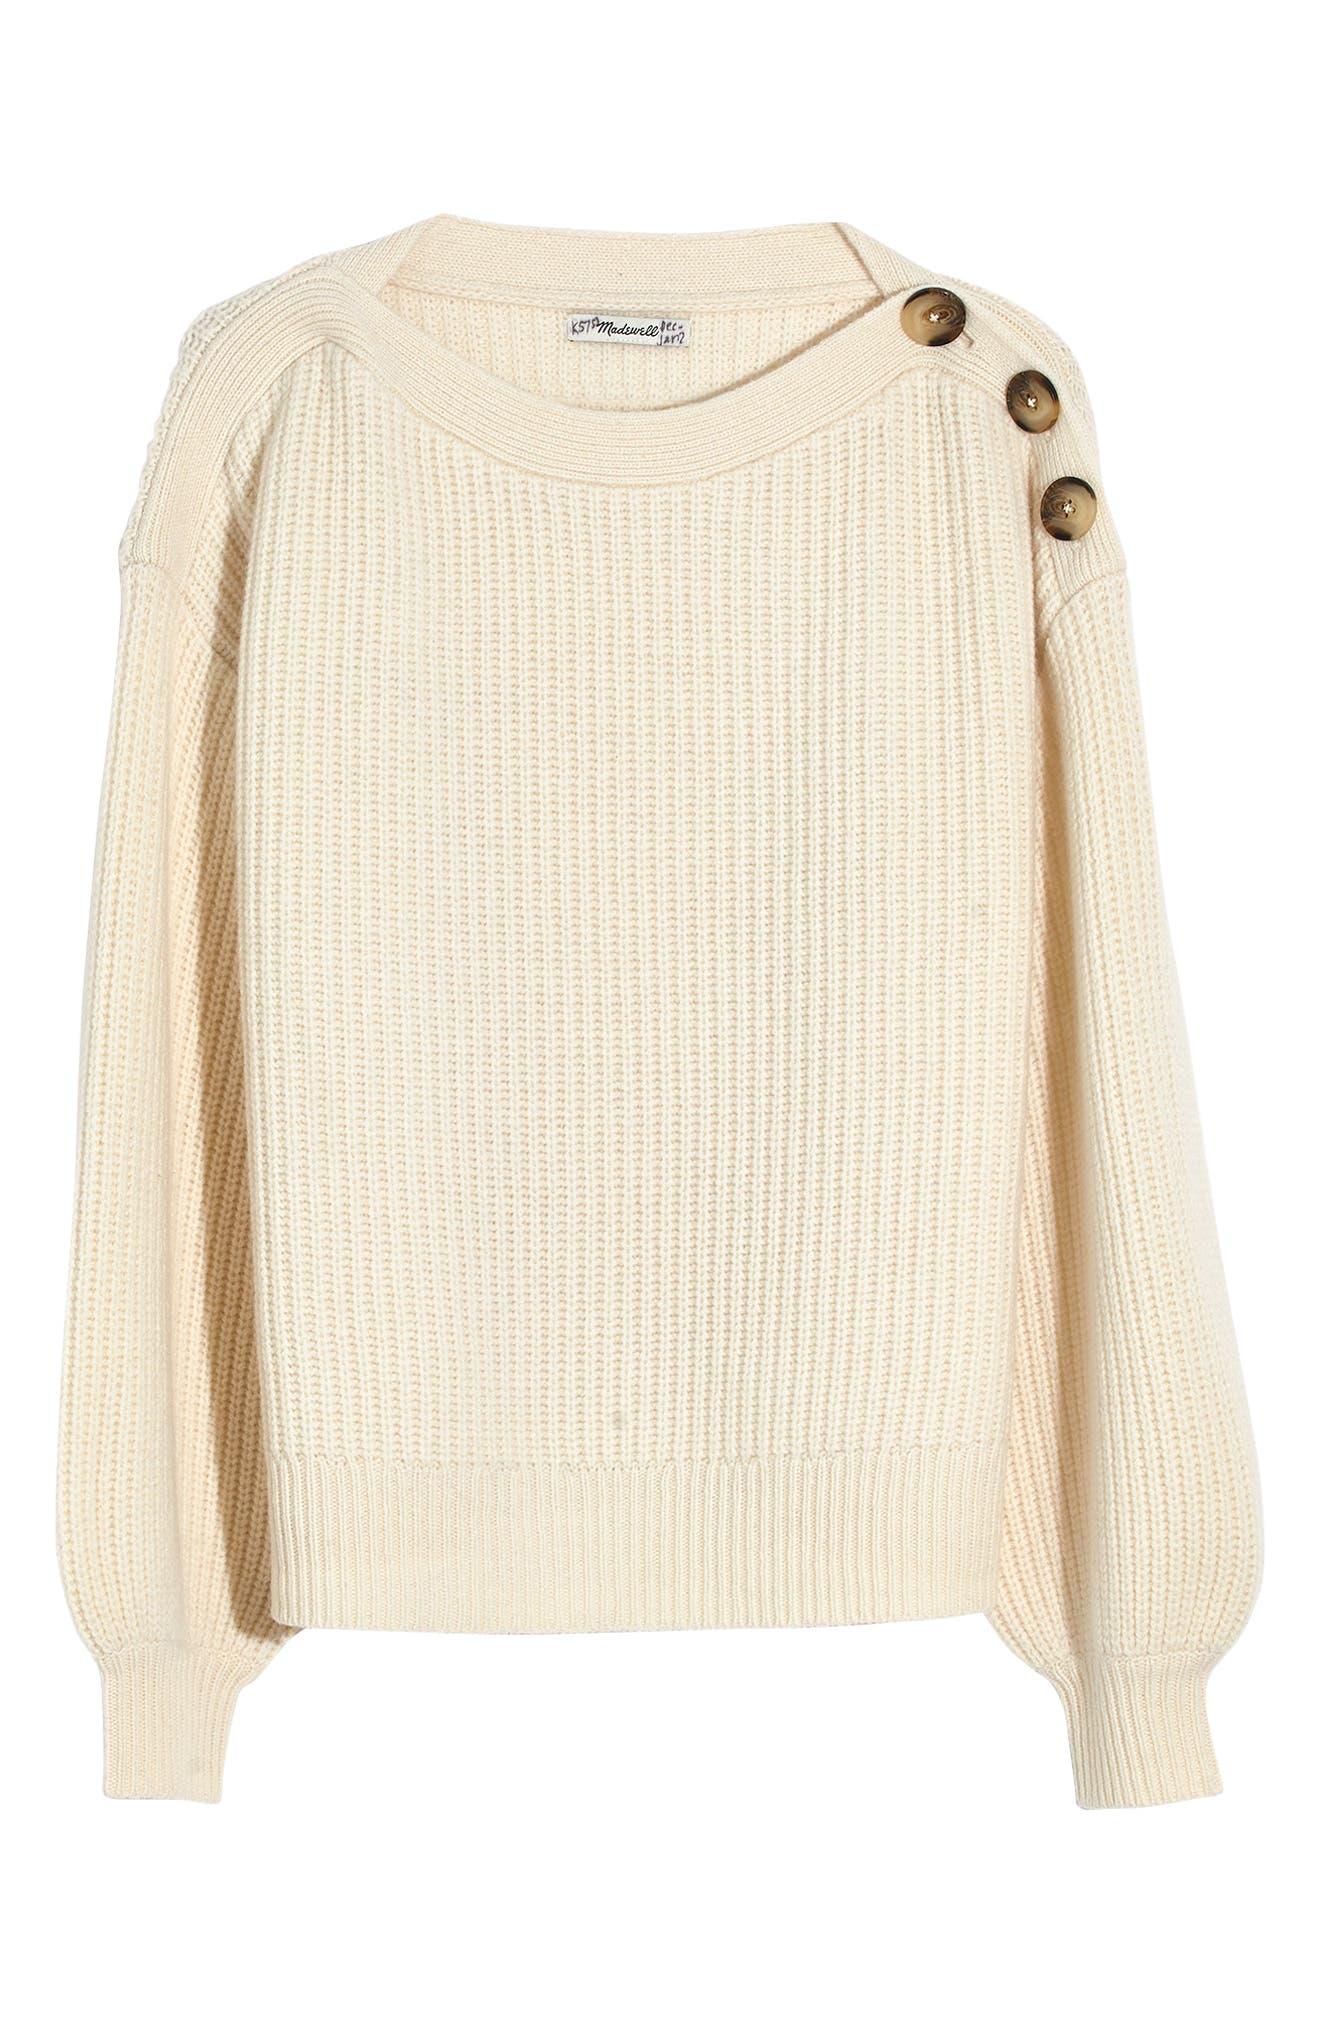 Boat Neck Button Shoulder Sweater,                             Alternate thumbnail 5, color,                             ANTIQUE CREAM